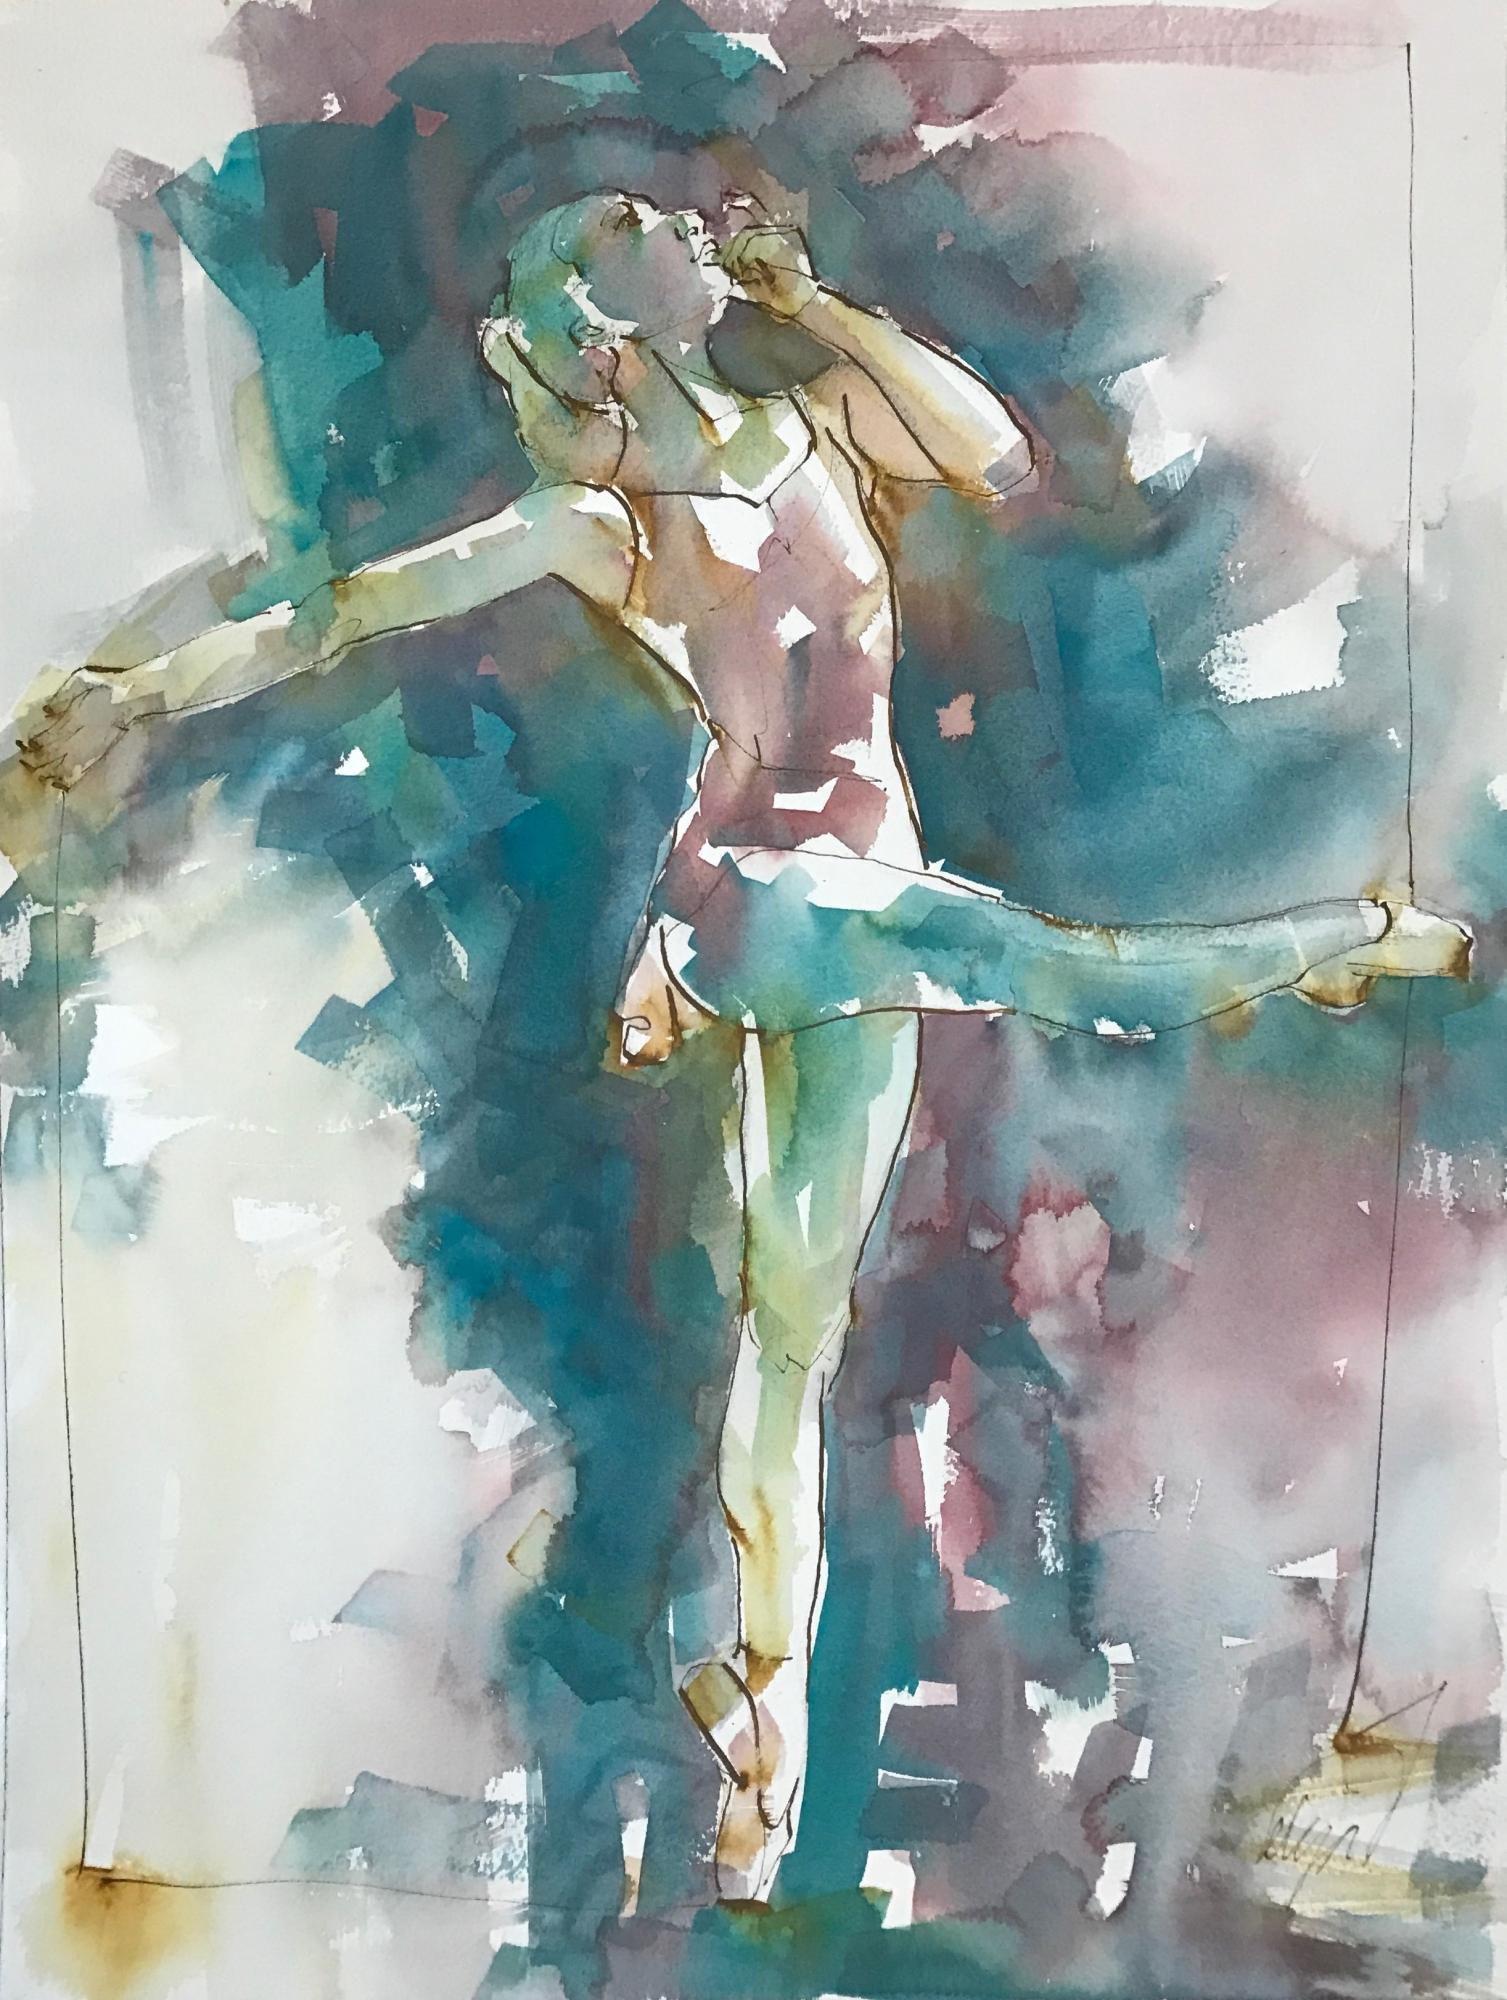 Dancer on Point V by Mel Delija